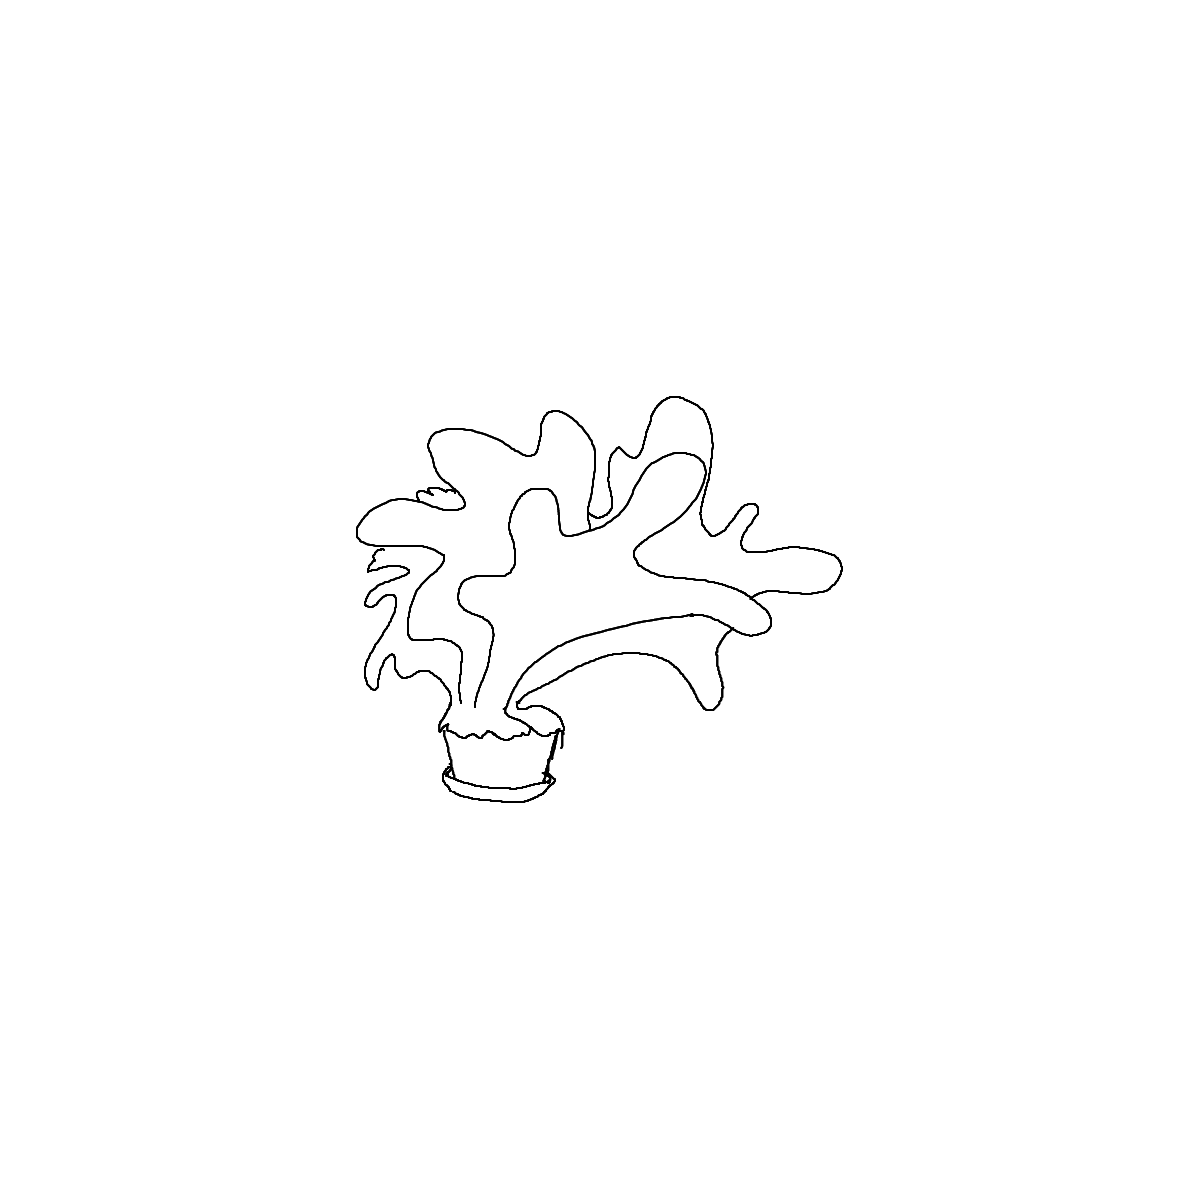 BAAAM drawing#8859 lat:52.0876083374023440lng: 4.3381991386413570